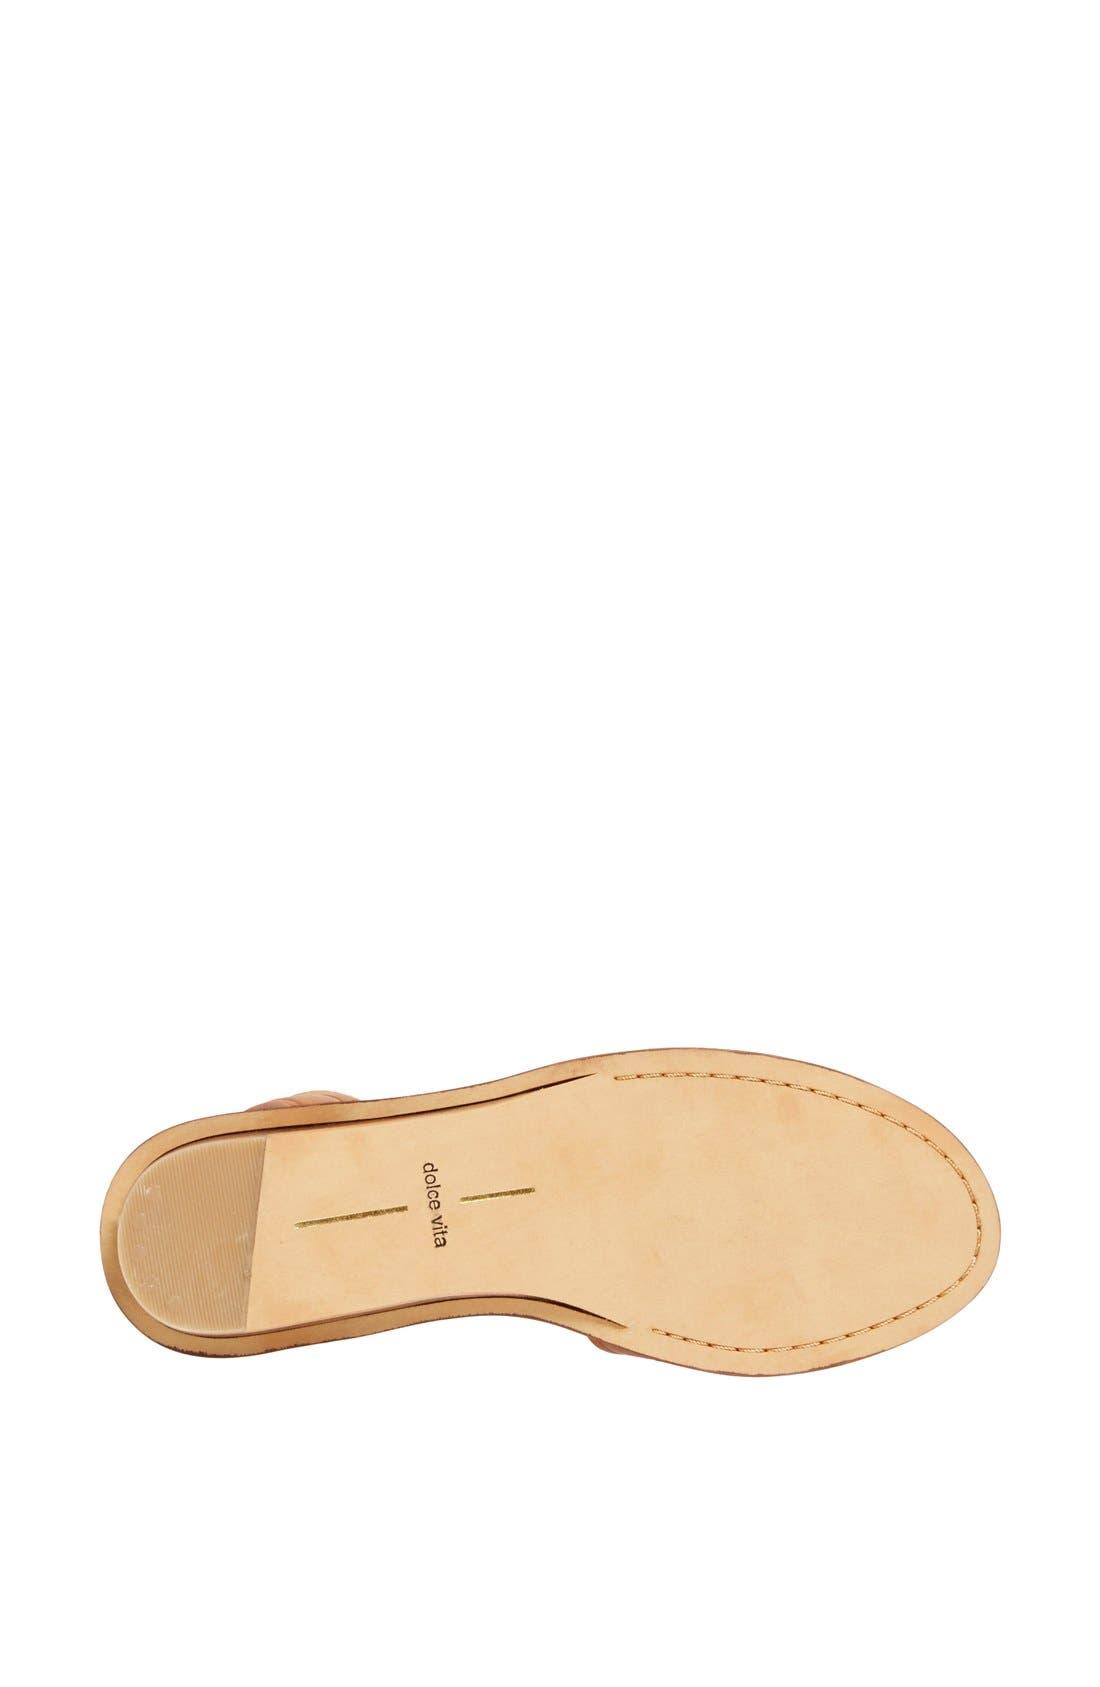 'Damalis' Sandal,                             Alternate thumbnail 2, color,                             200